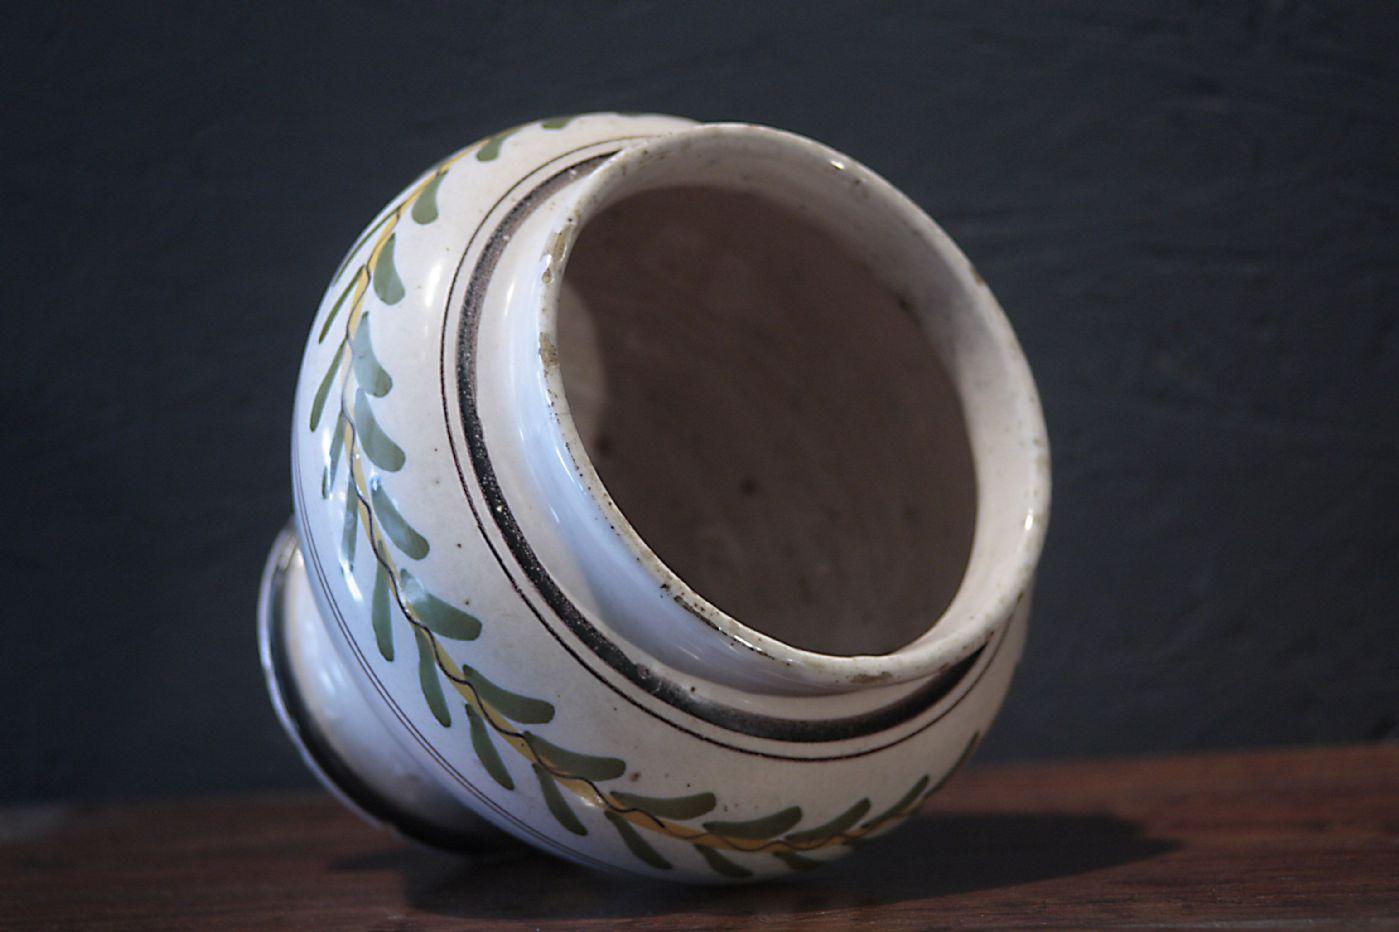 thumb9|Vaso in Maiolica, Siena, Luigi XVI